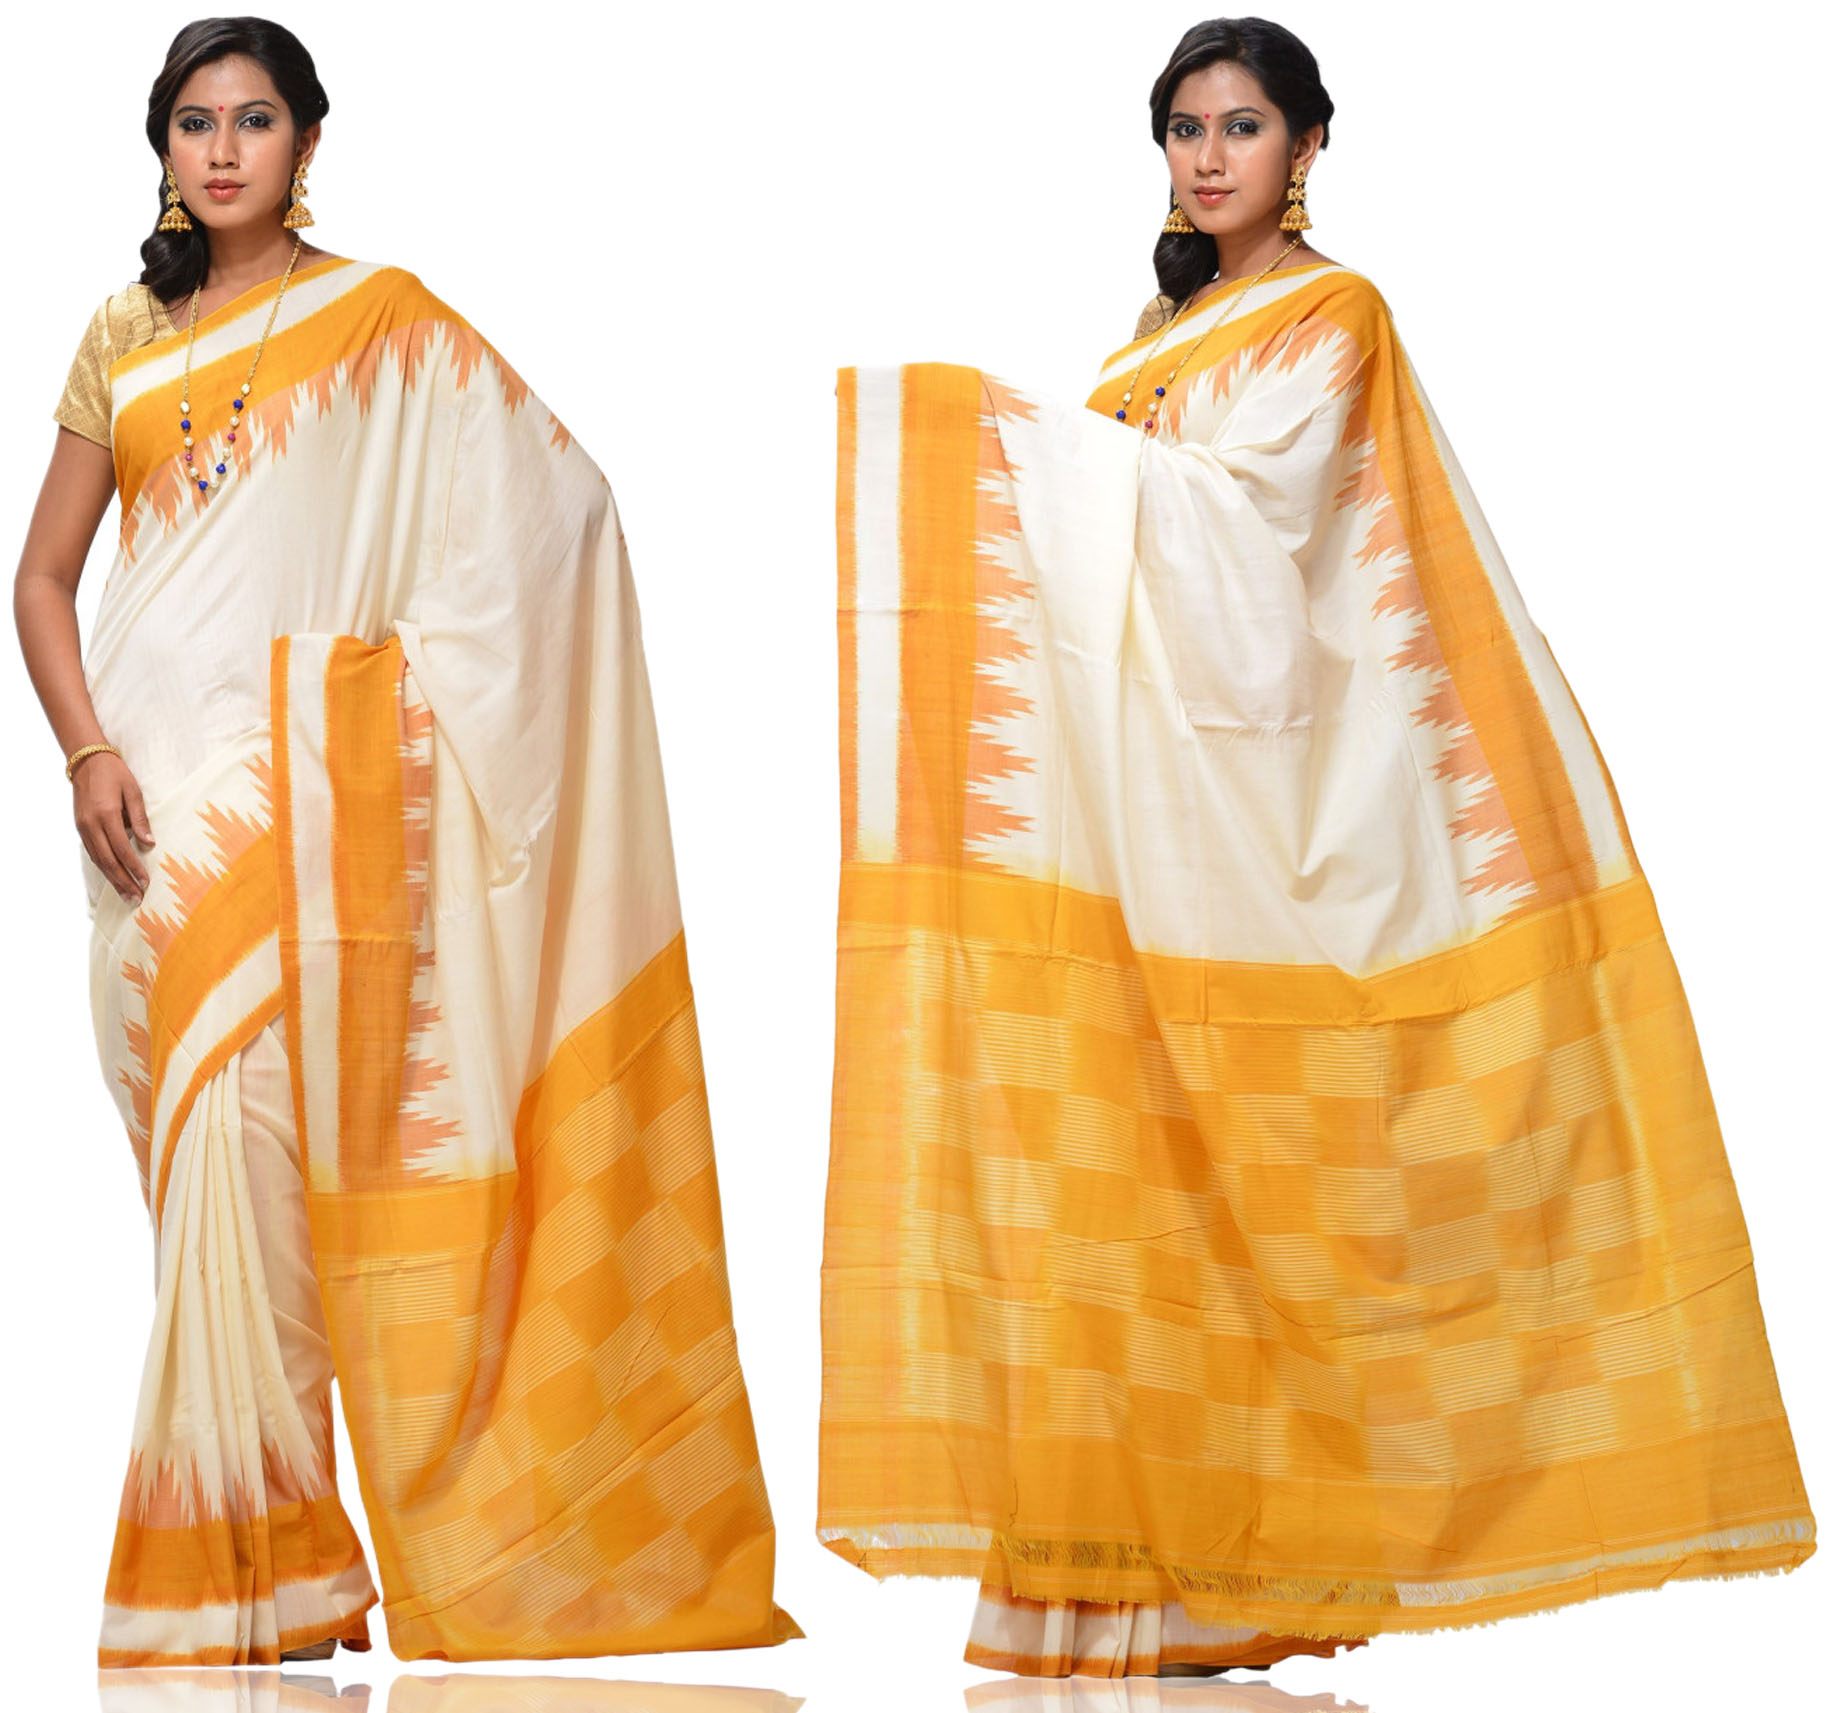 Price:- 3700/-   New collection of Ikkat sarees, ikkat Silk sarees, ikkat Cotton sarees, ikkat sarees. Sign up now for E-book you will be updated with latest collection of ethnic verities. For More Info Click on :- www.uppada.com  We manufacture of Uppada sarees, Paithani sarees, Banarasi sarees, Venkatagiri Sarees, Gadwal Sarees, Khadi sarees, Hand Painted Kalamkari Dupatta, Ikkat sarees, Kanchipuram Sarees, Atr Poly Silk Sarees, Dupattas, Stoles etc. For more info us at 040 64640303, 441905005.  Buy online: - uppada.com  - by Paithani, Hyderabad